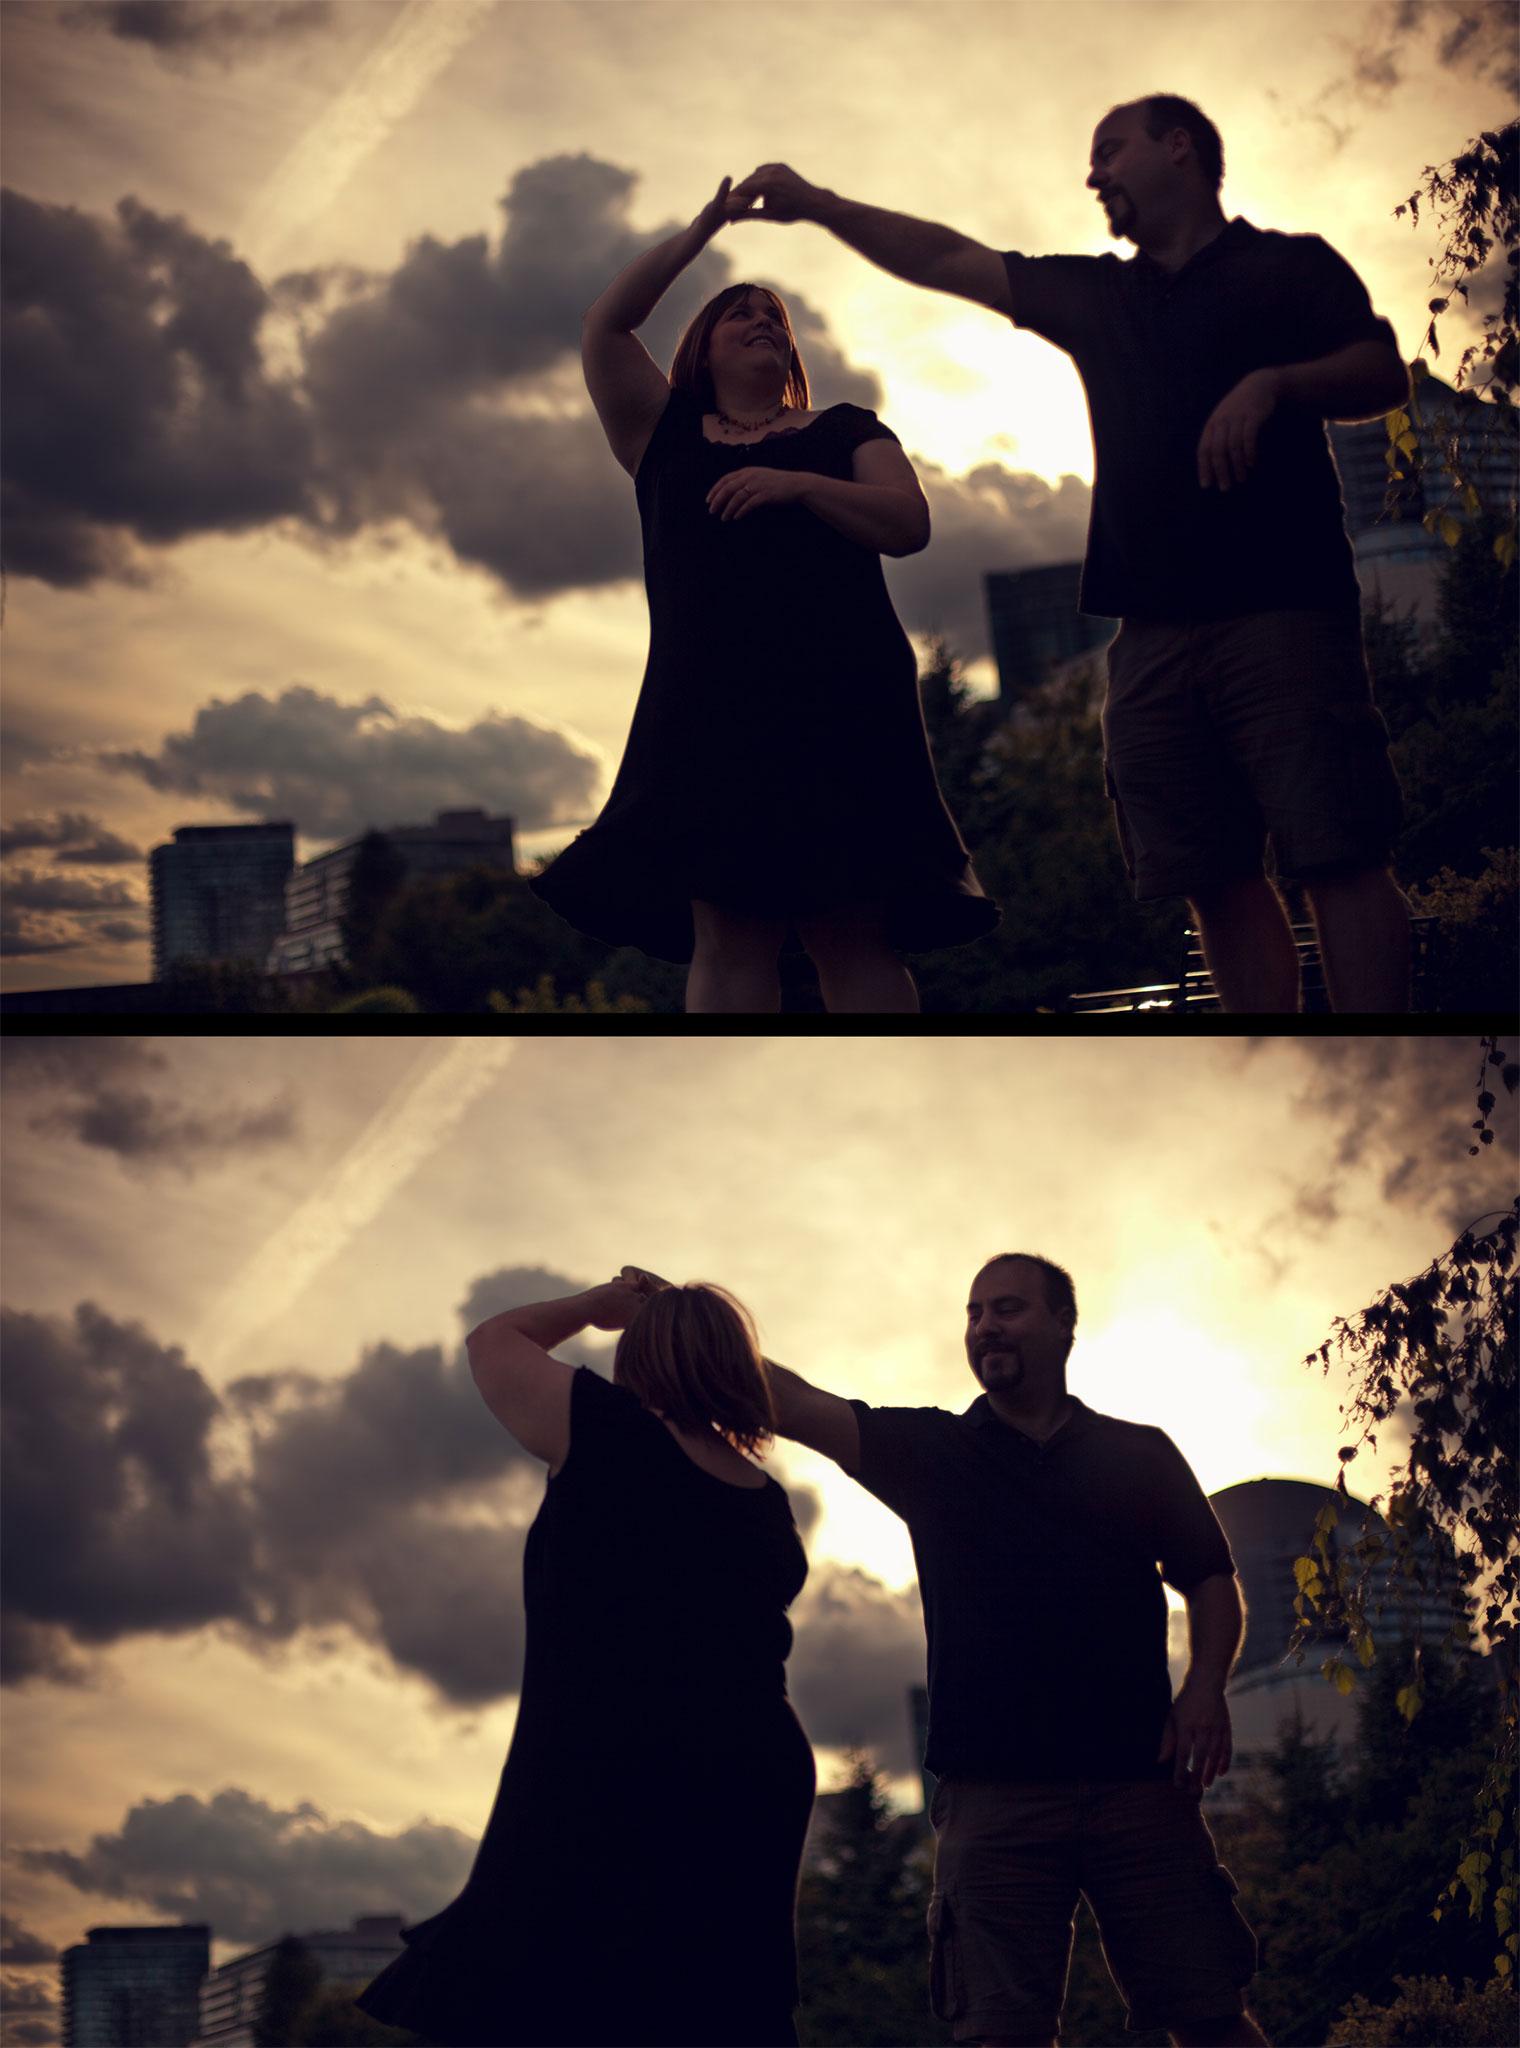 wedding-photographer-toronto-canada-shayne-gray_dance.jpg